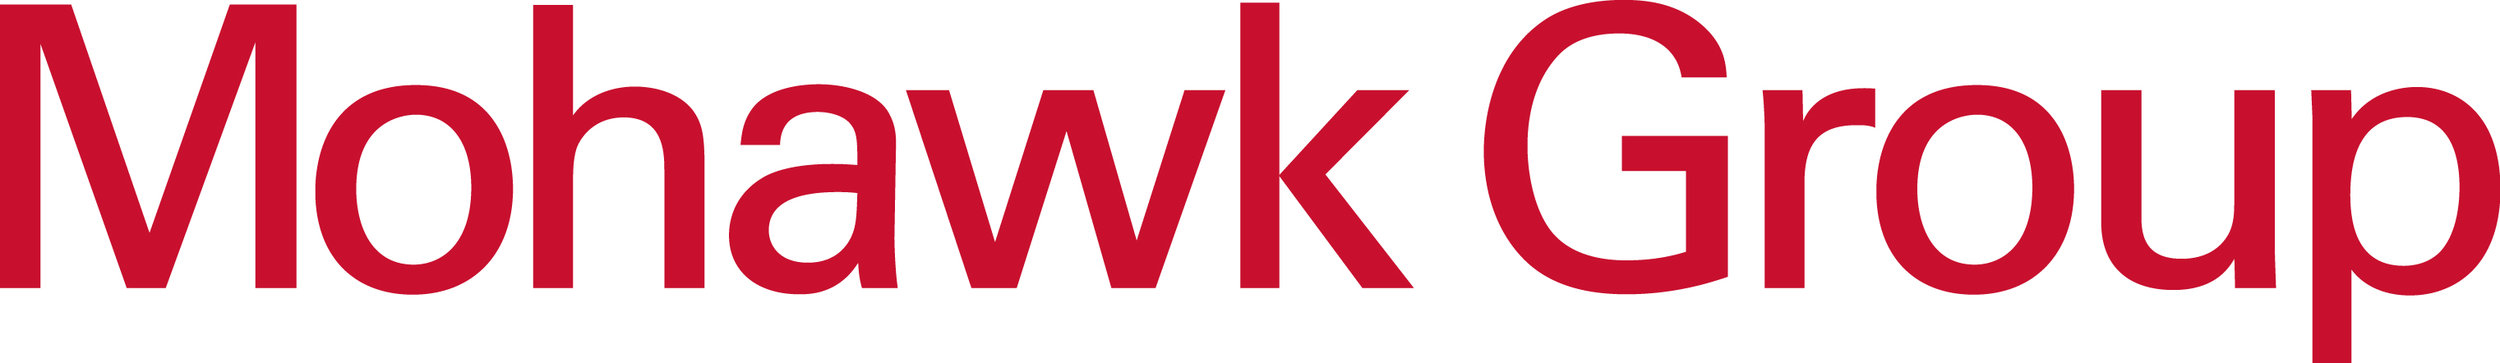 2017_Mohawk_Group_Logotype_186U.jpg